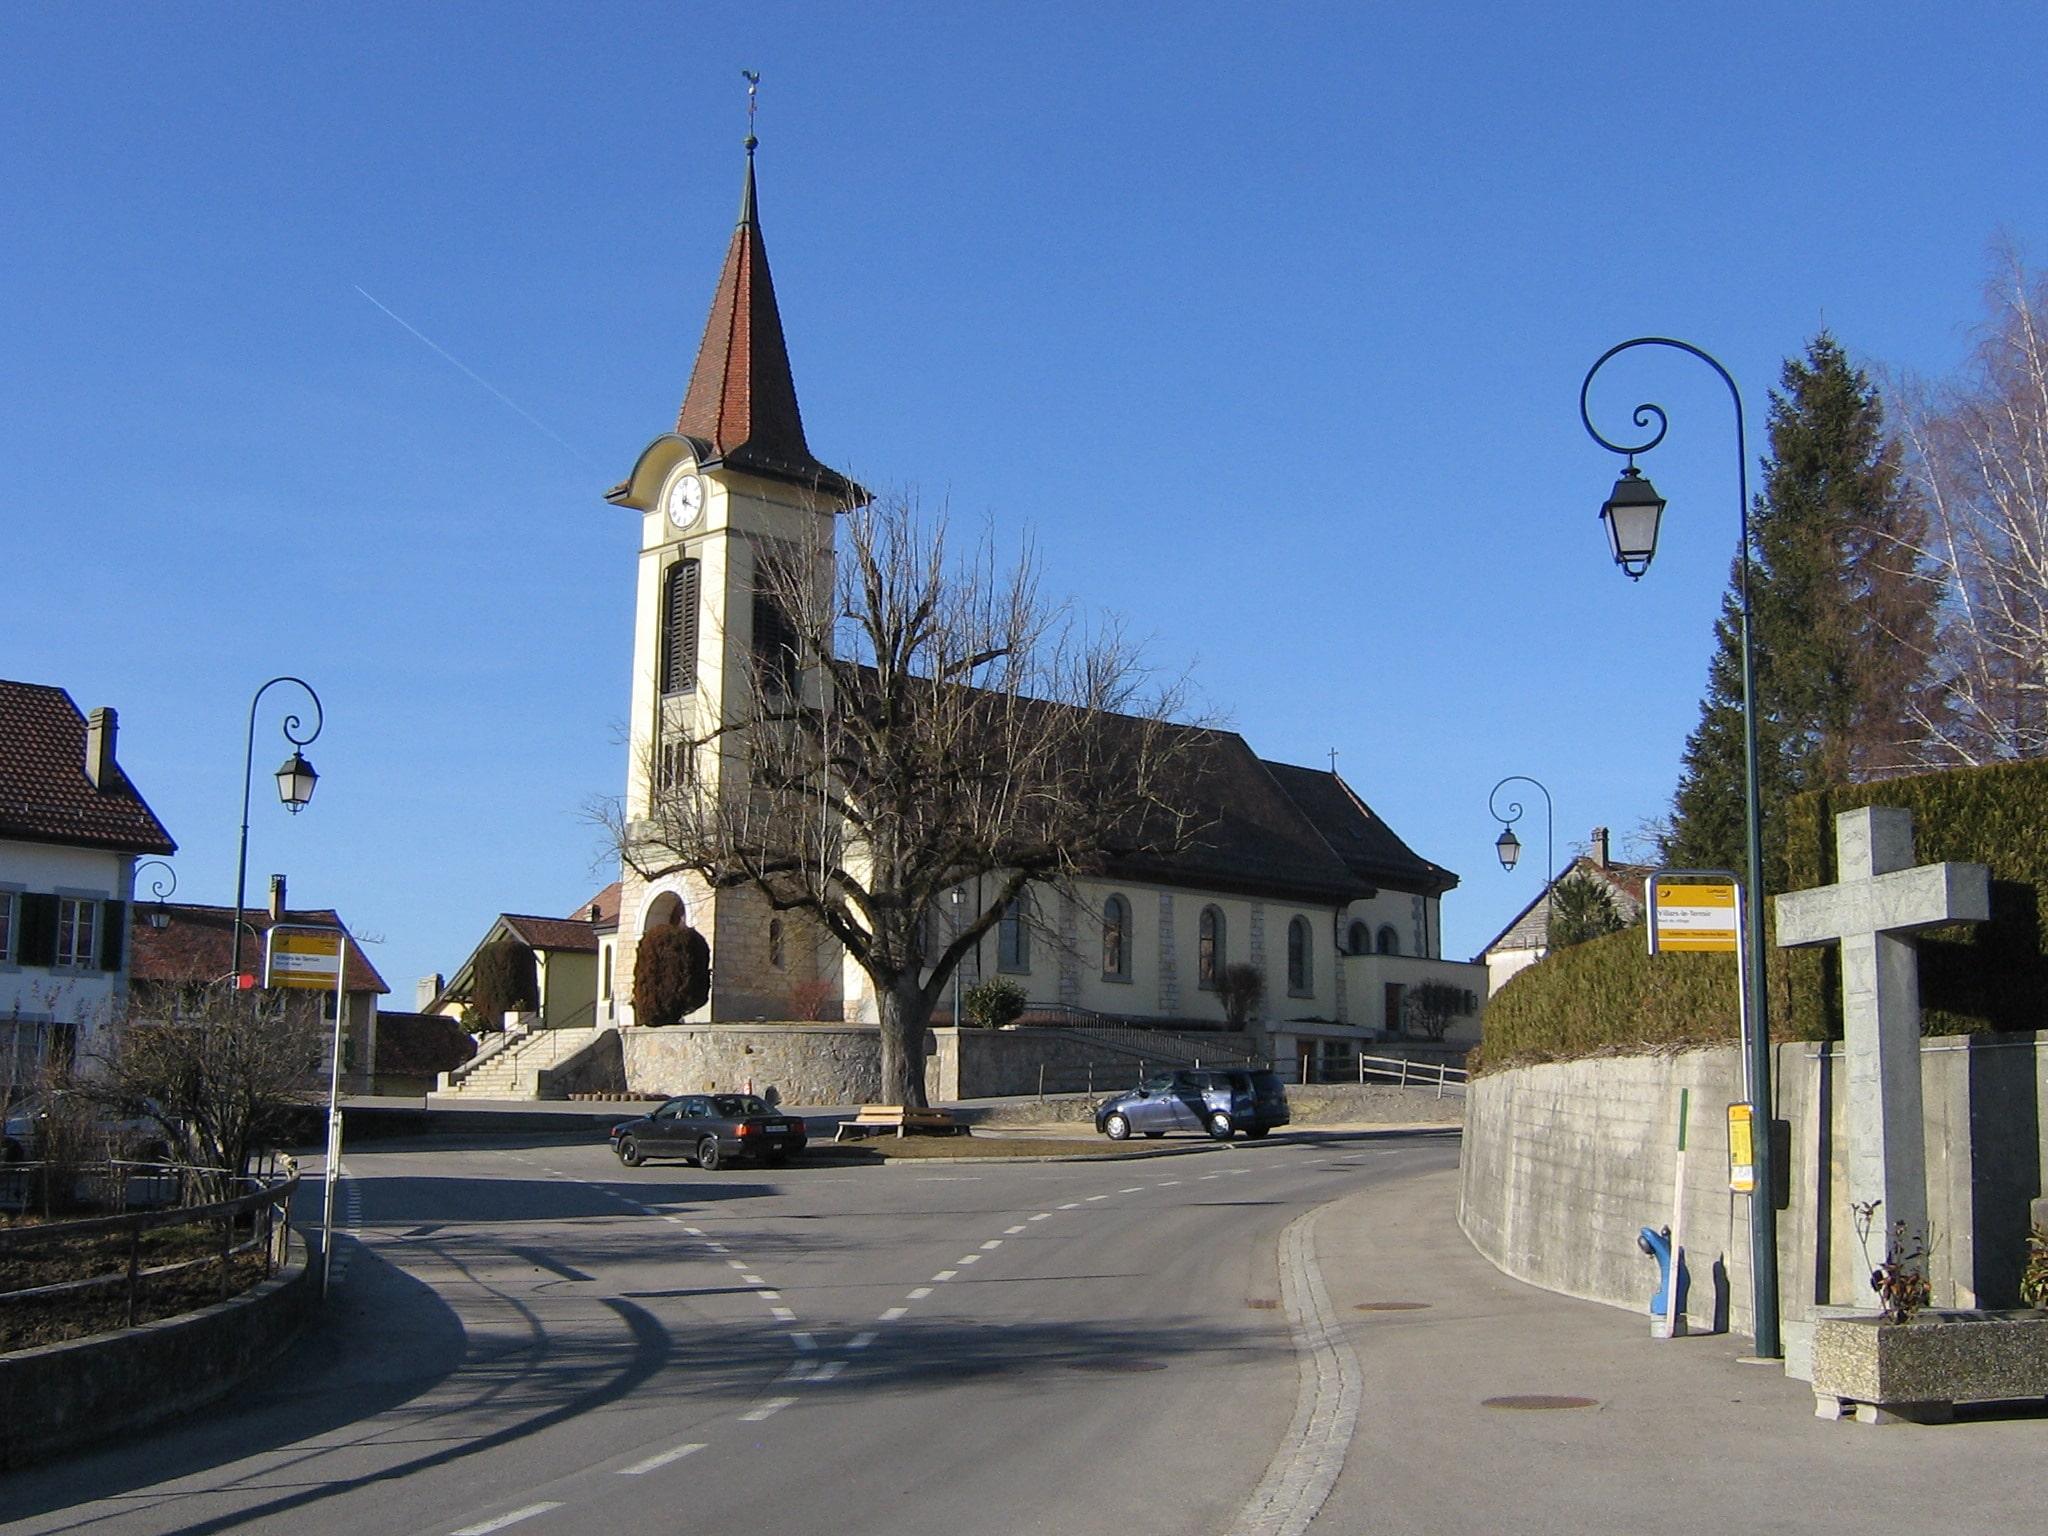 Villars-le-Terroir